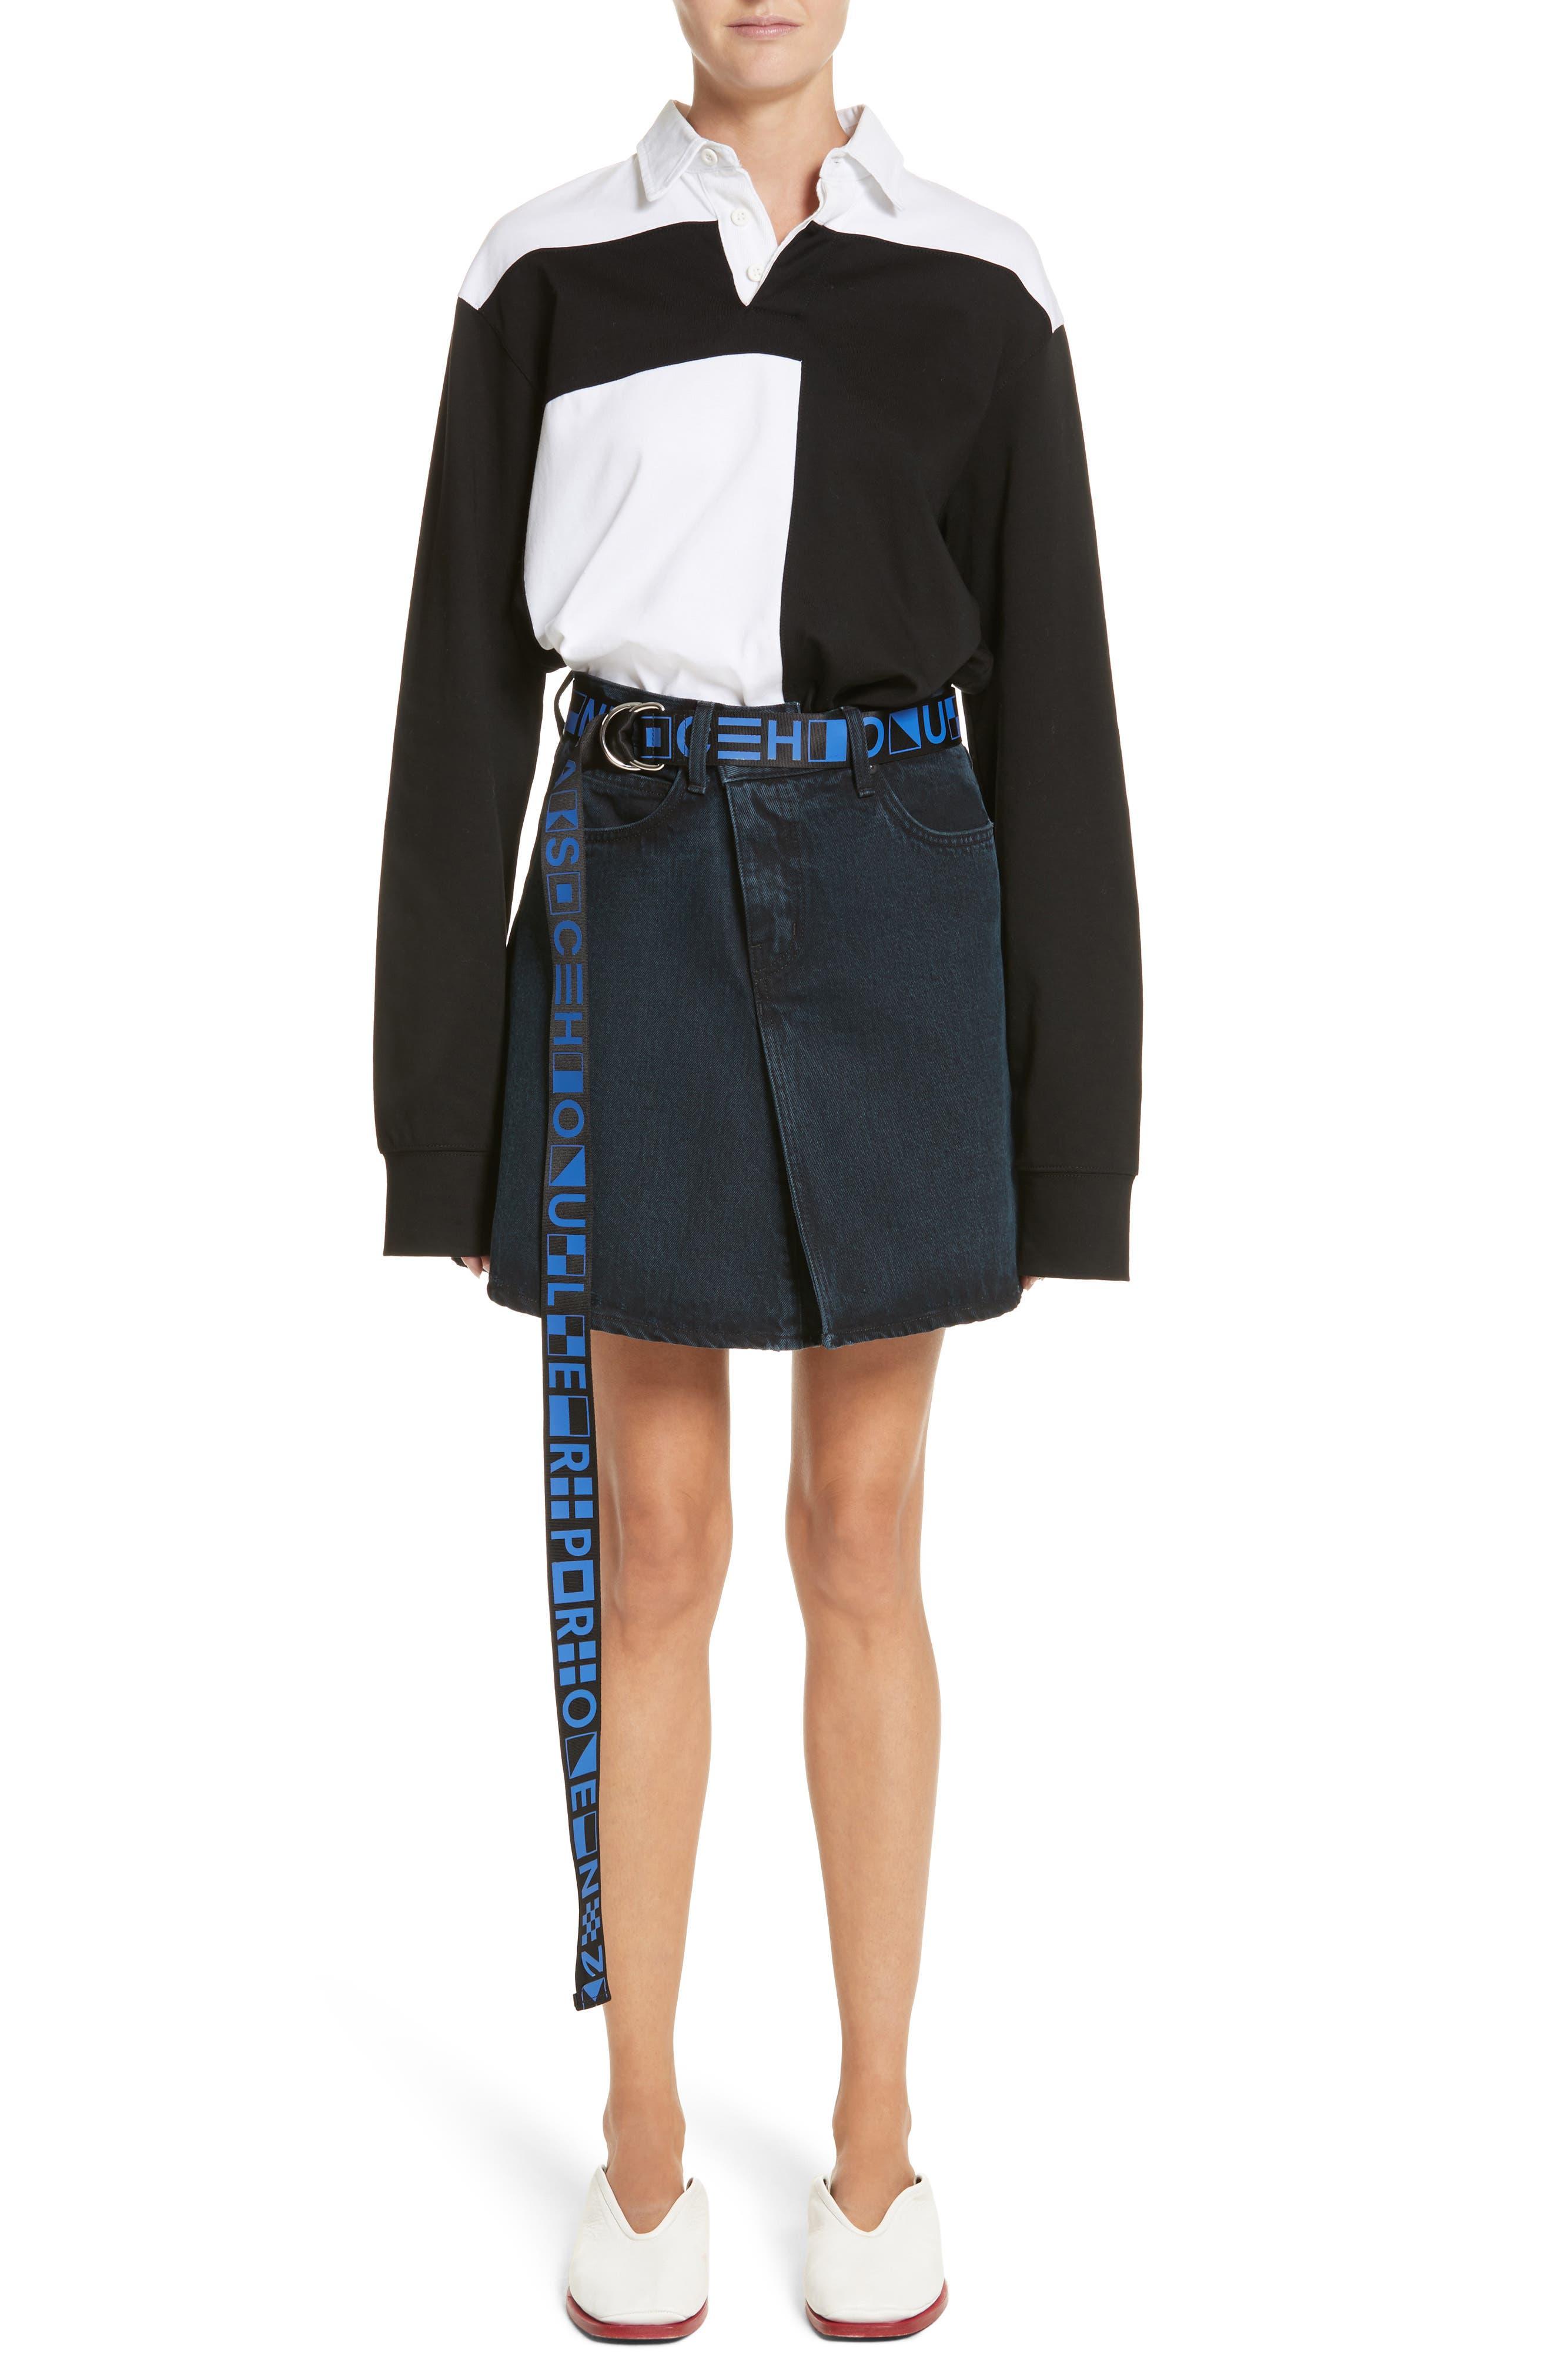 PSWL Folded Denim Skirt,                             Alternate thumbnail 8, color,                             Stone Washed Black